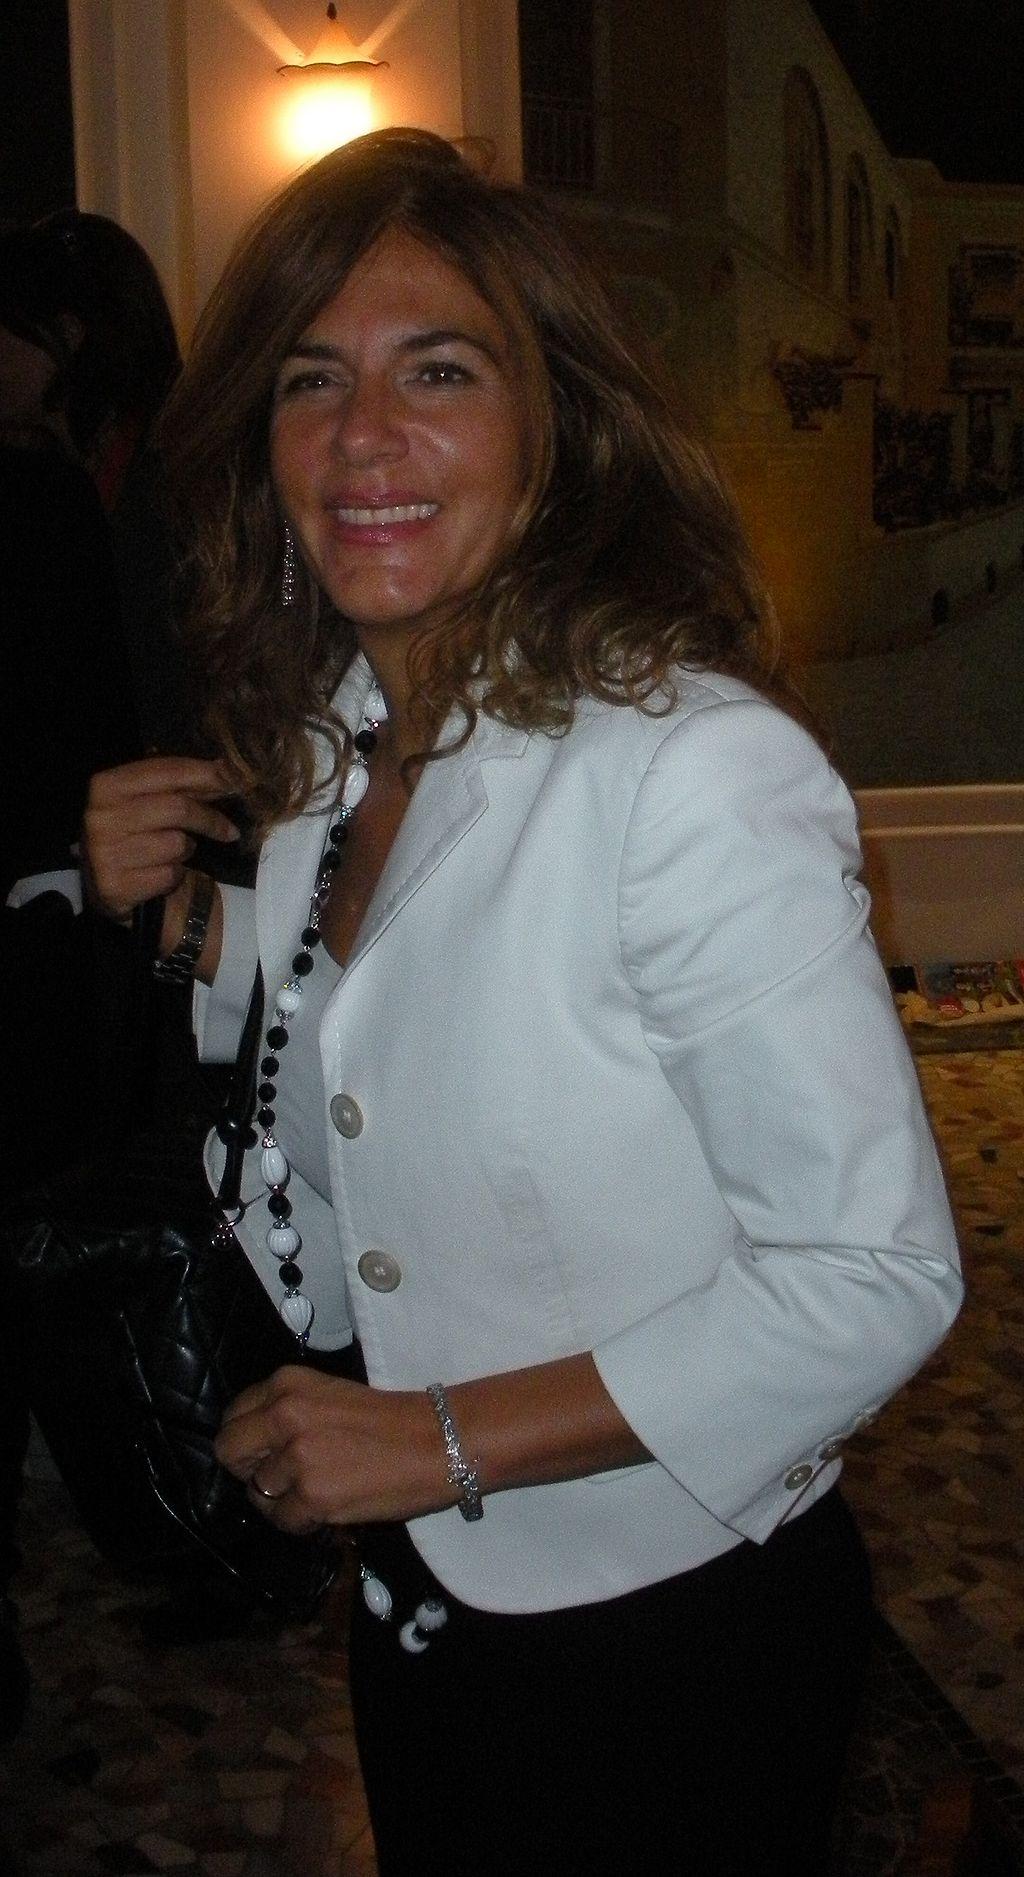 Emma Marcegaglia, Famous Italian Women Who Changed History - The Proud Italian